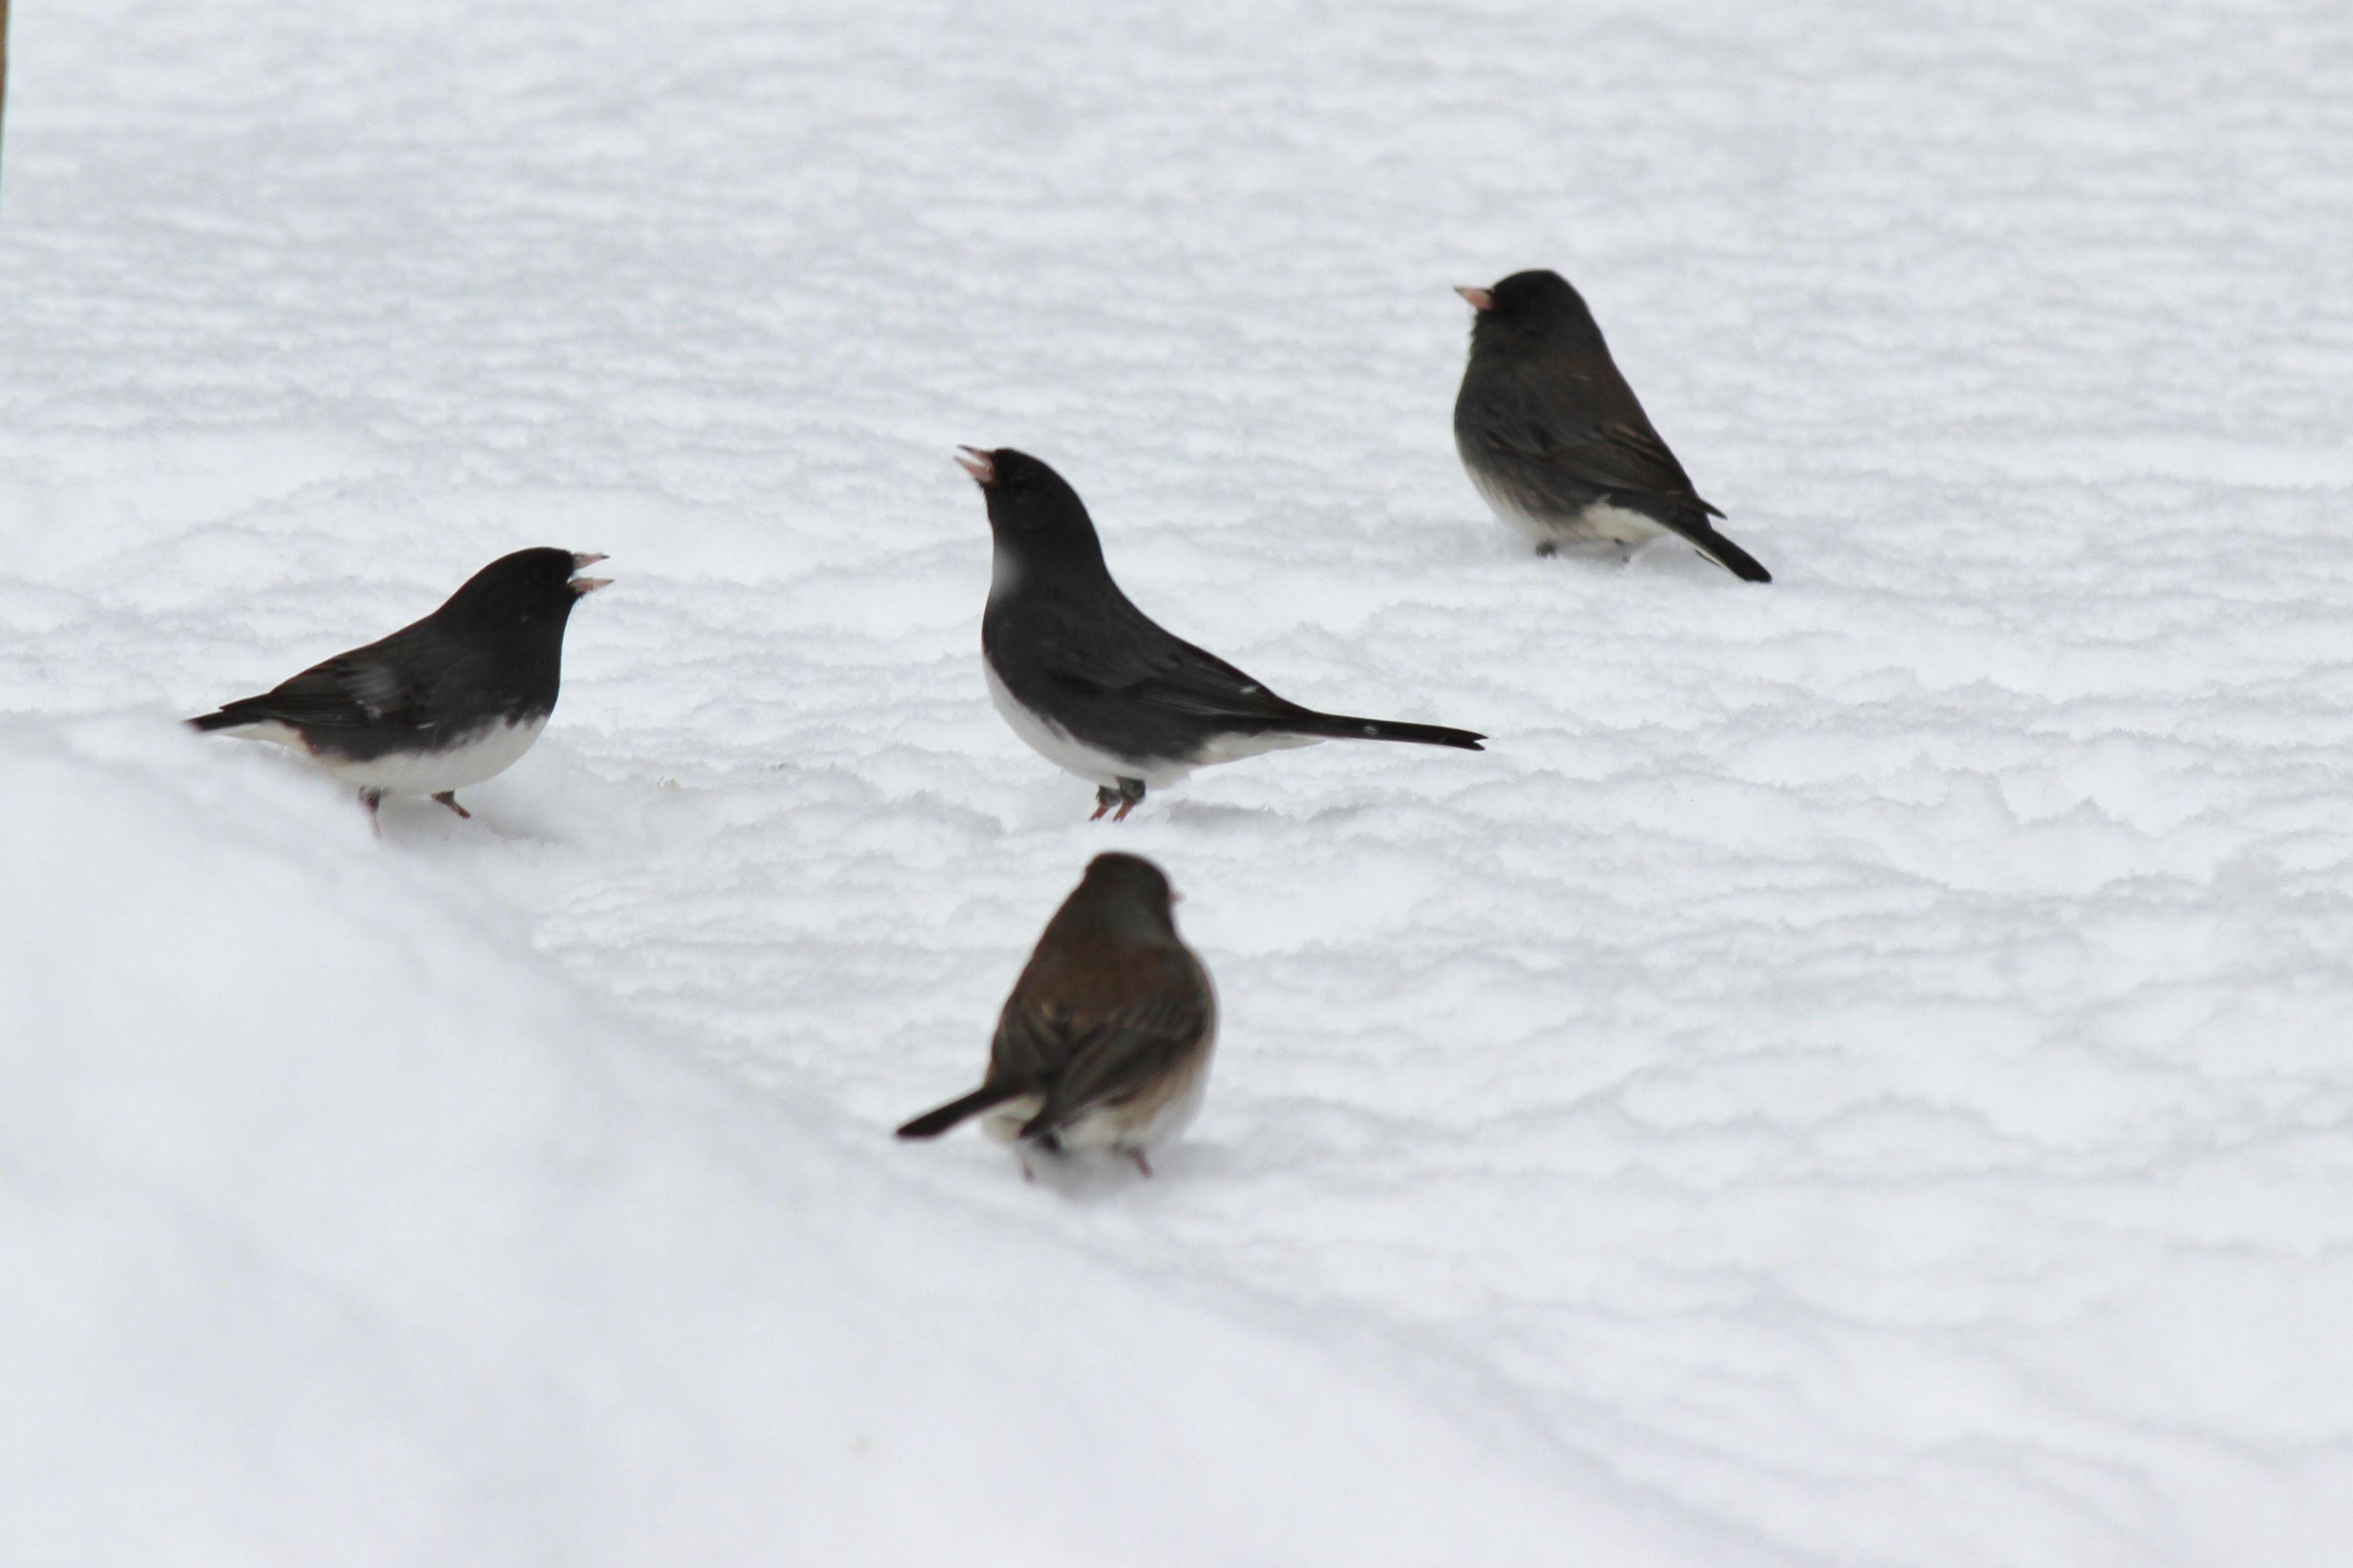 """#WinterinCT"" "" #CenterofCT"".... Center of Ct photo contest.......... Singing in the snow.........."